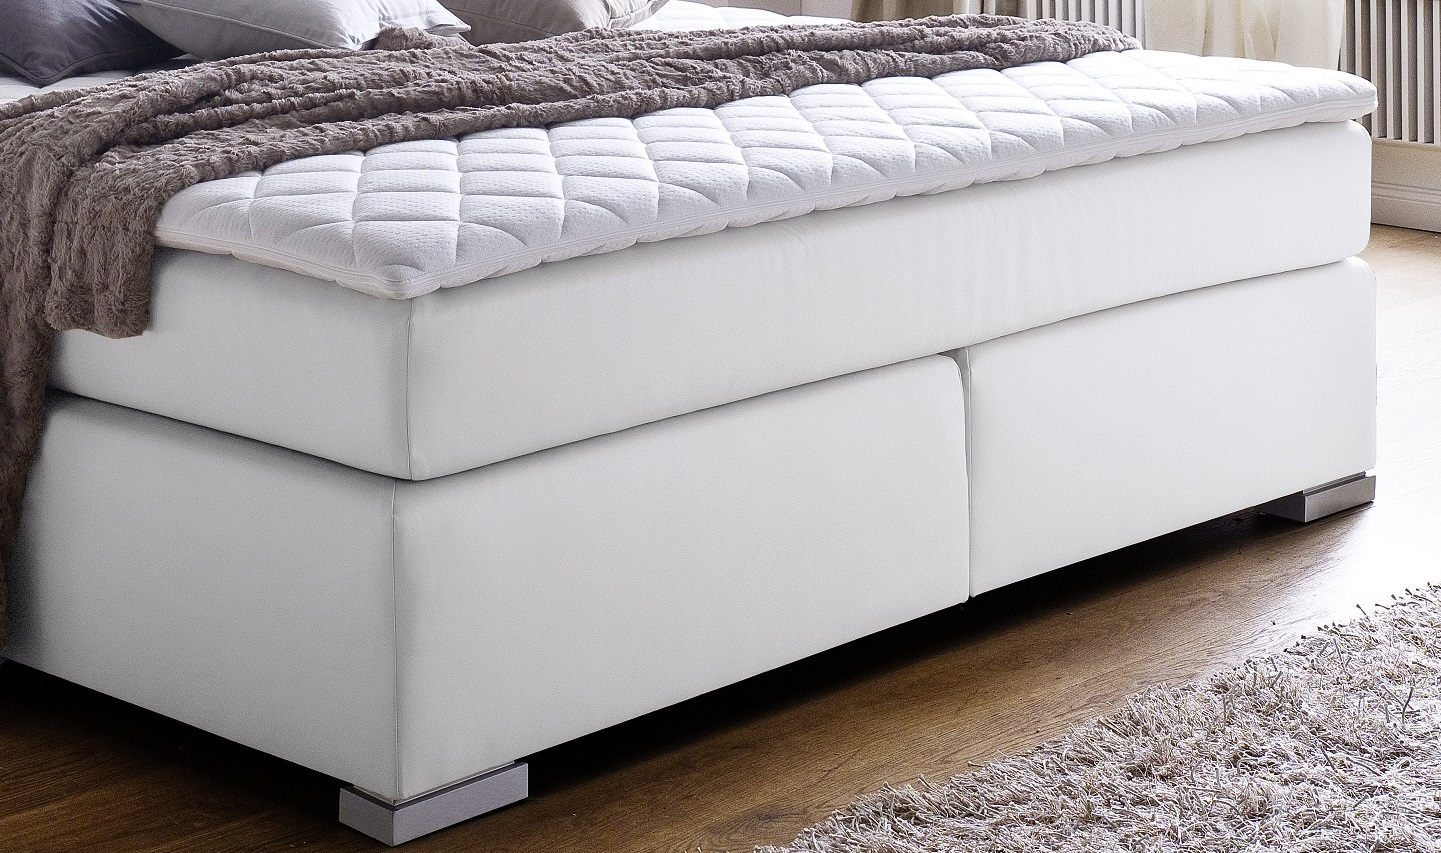 boxspringbett isabelle wei 180cm x 200cm. Black Bedroom Furniture Sets. Home Design Ideas